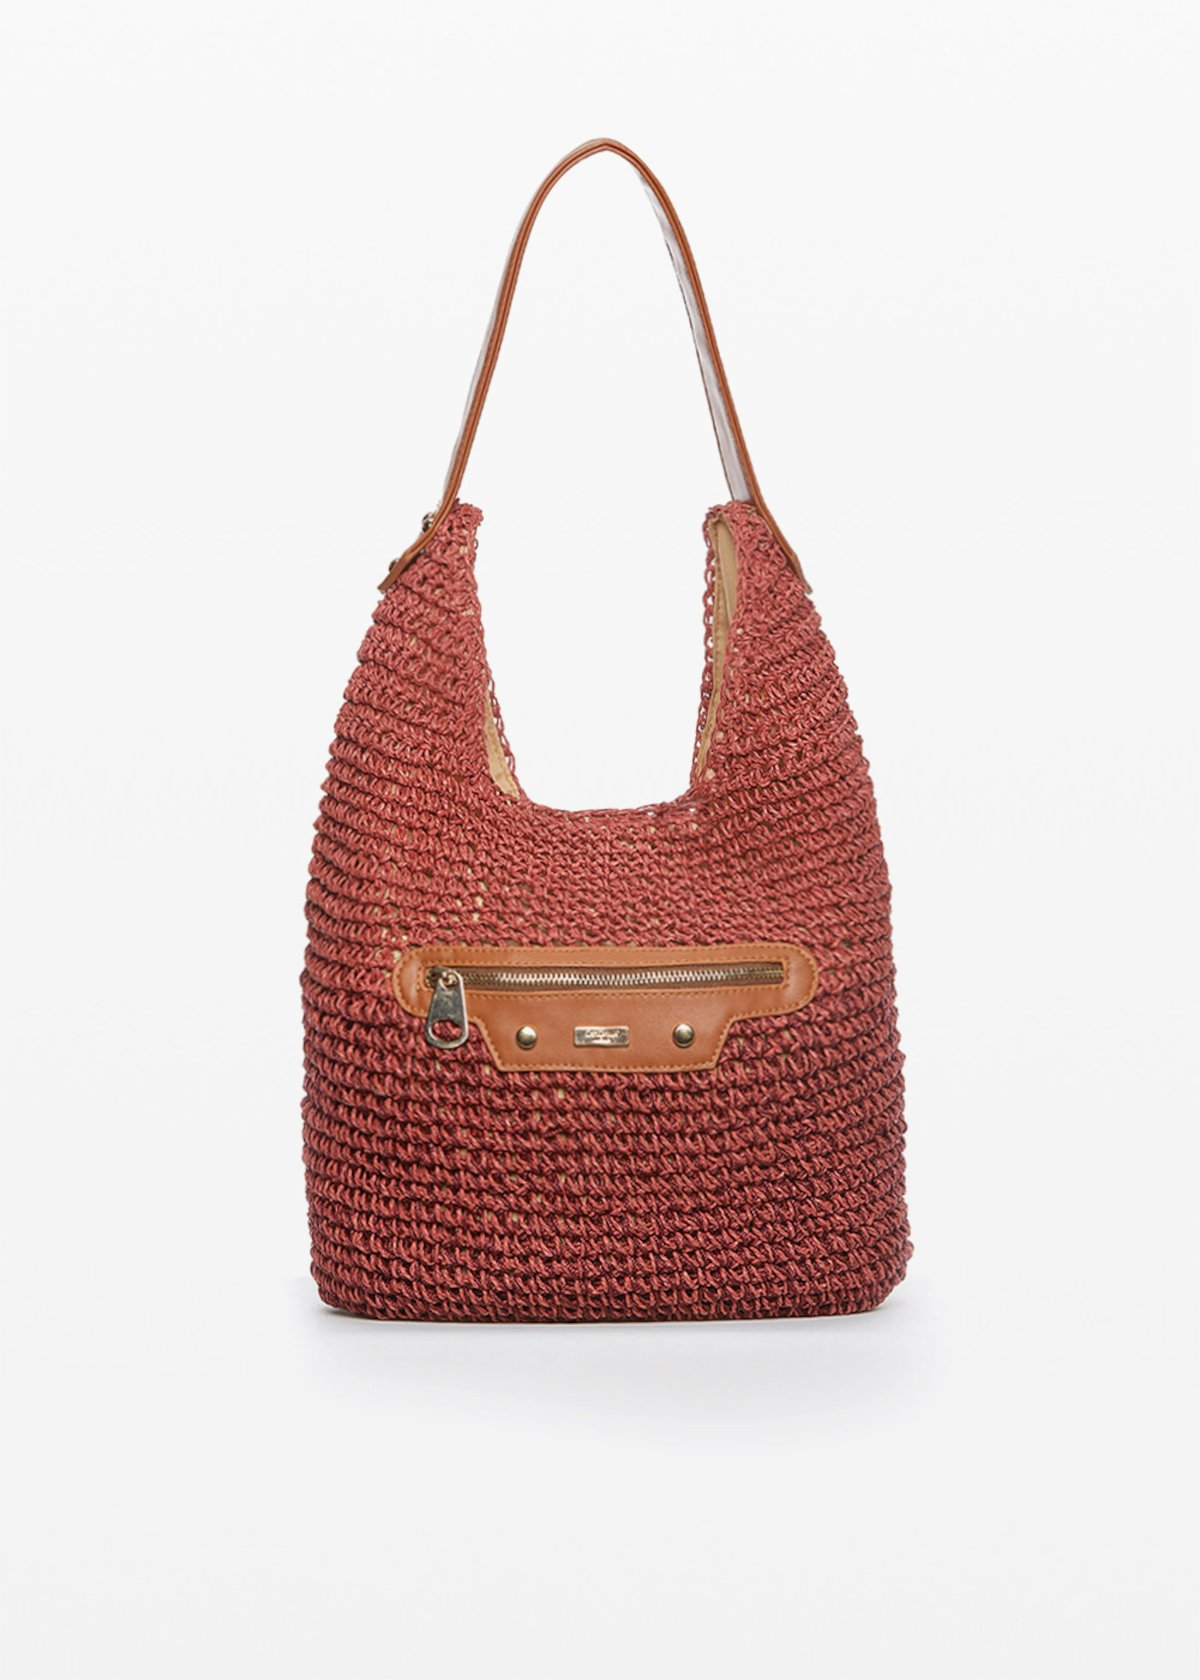 Bicolor Woven Straw Hobo Bag Broken